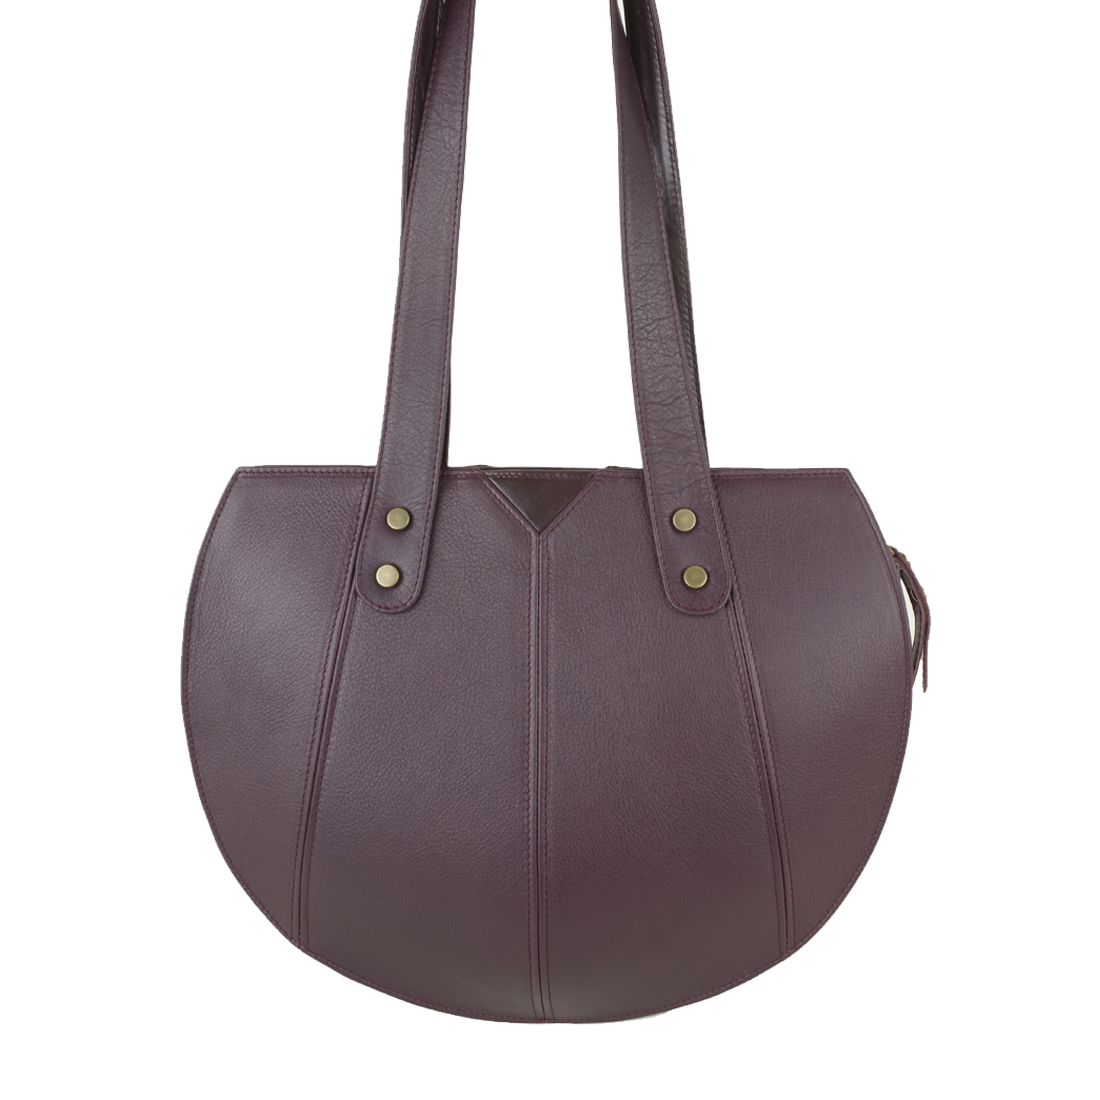 Carrie Bordeaux Leather Shoulder Bag